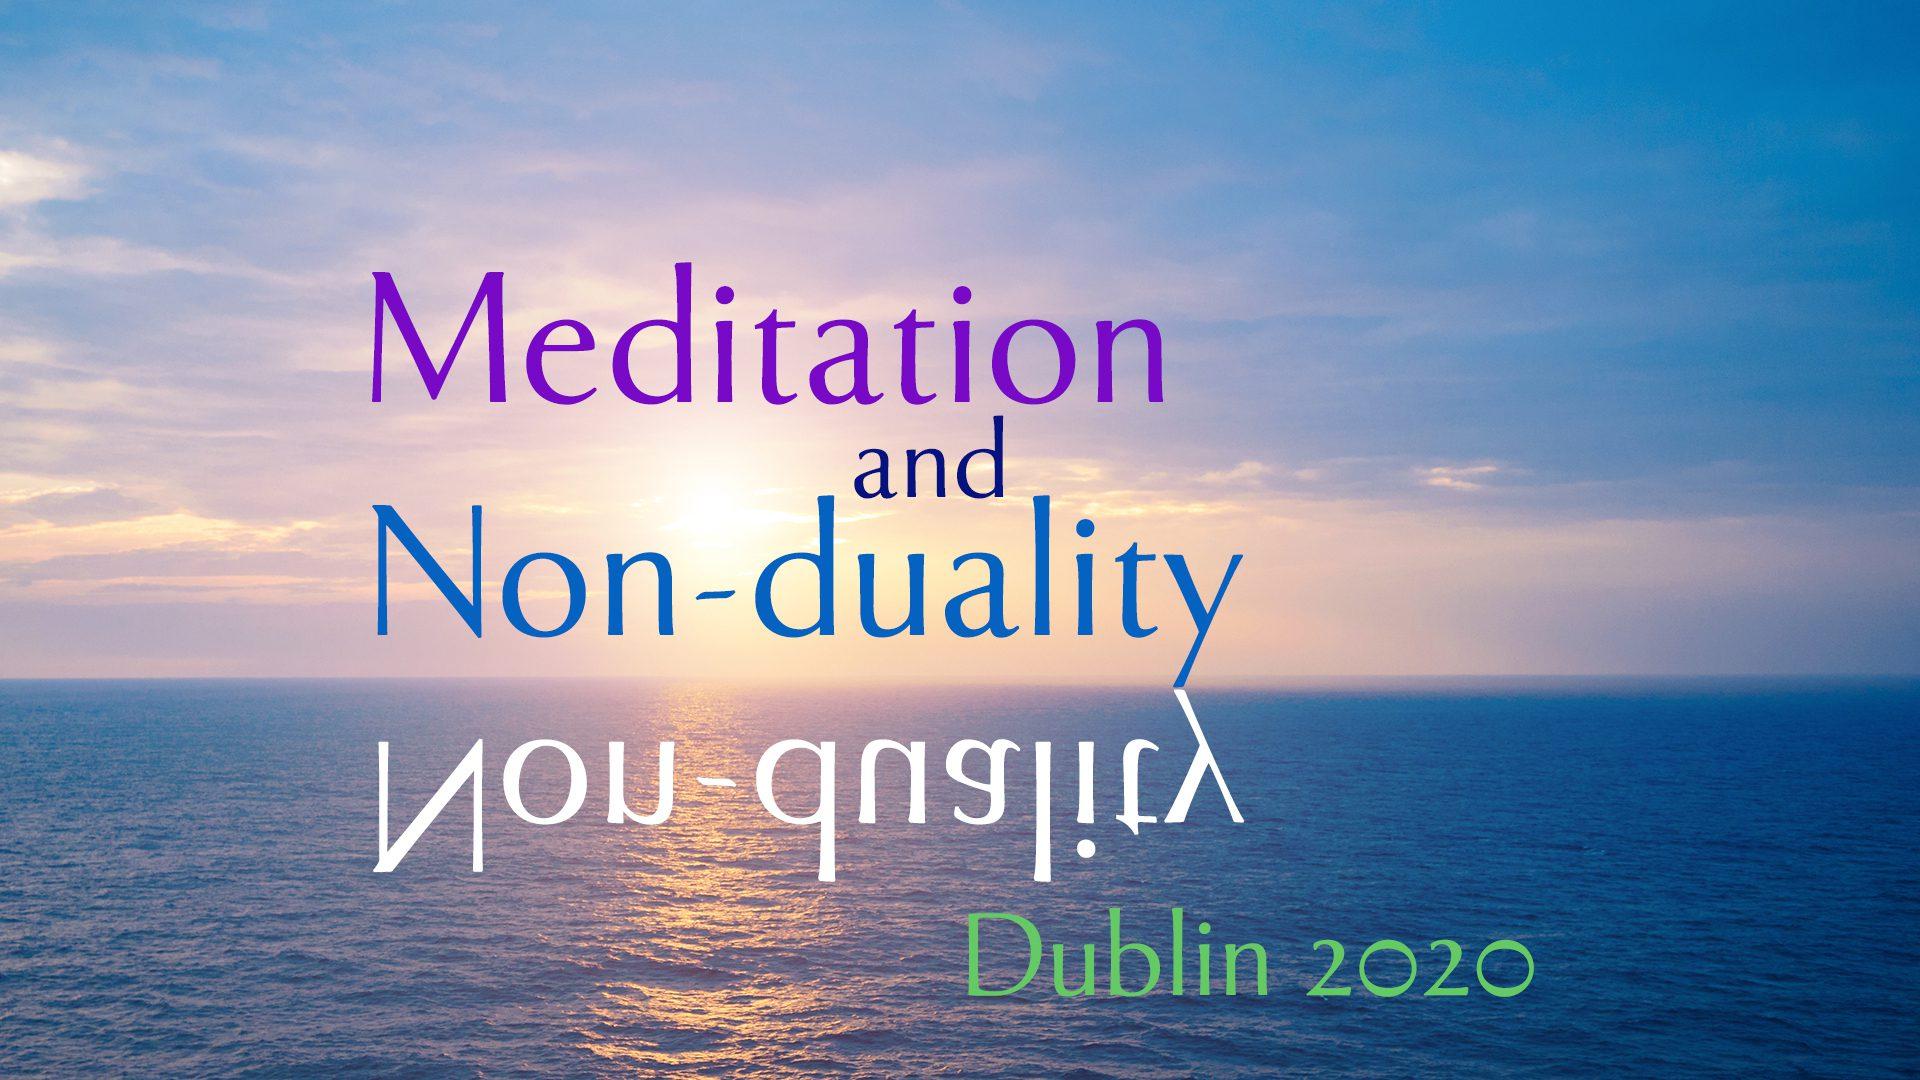 Meditation-and-ND-Dublin-01